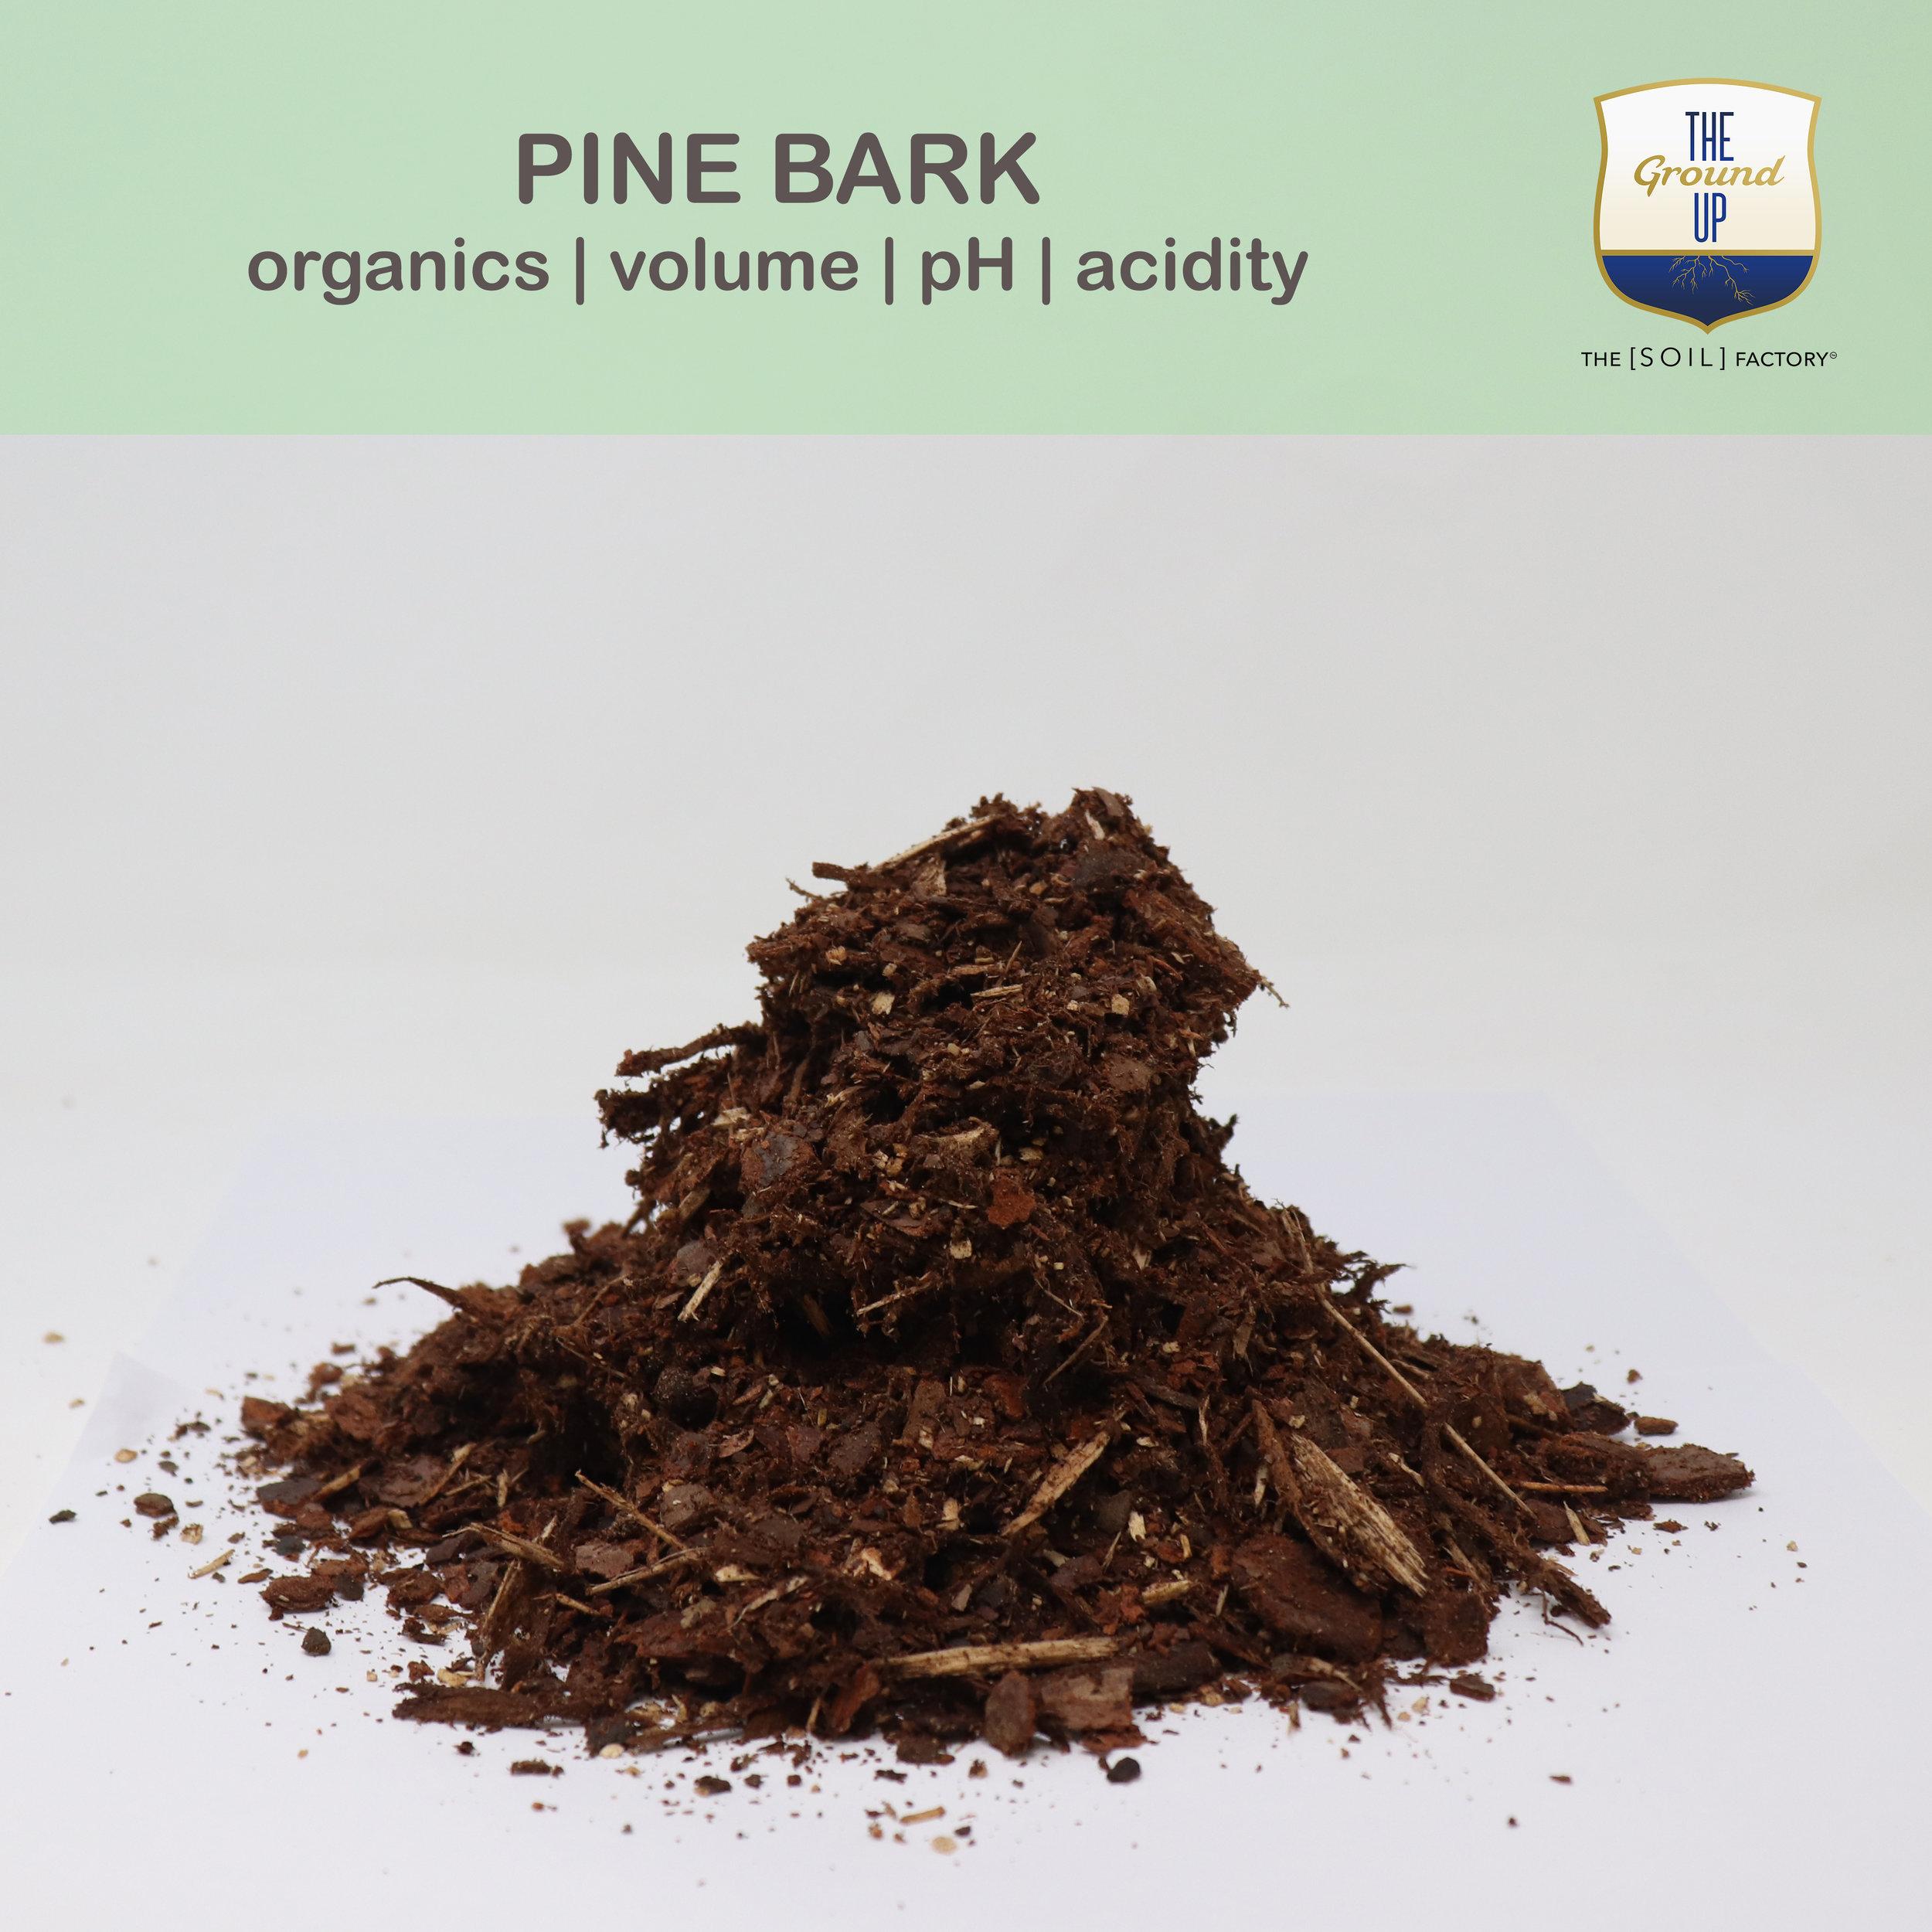 PineBark.jpg